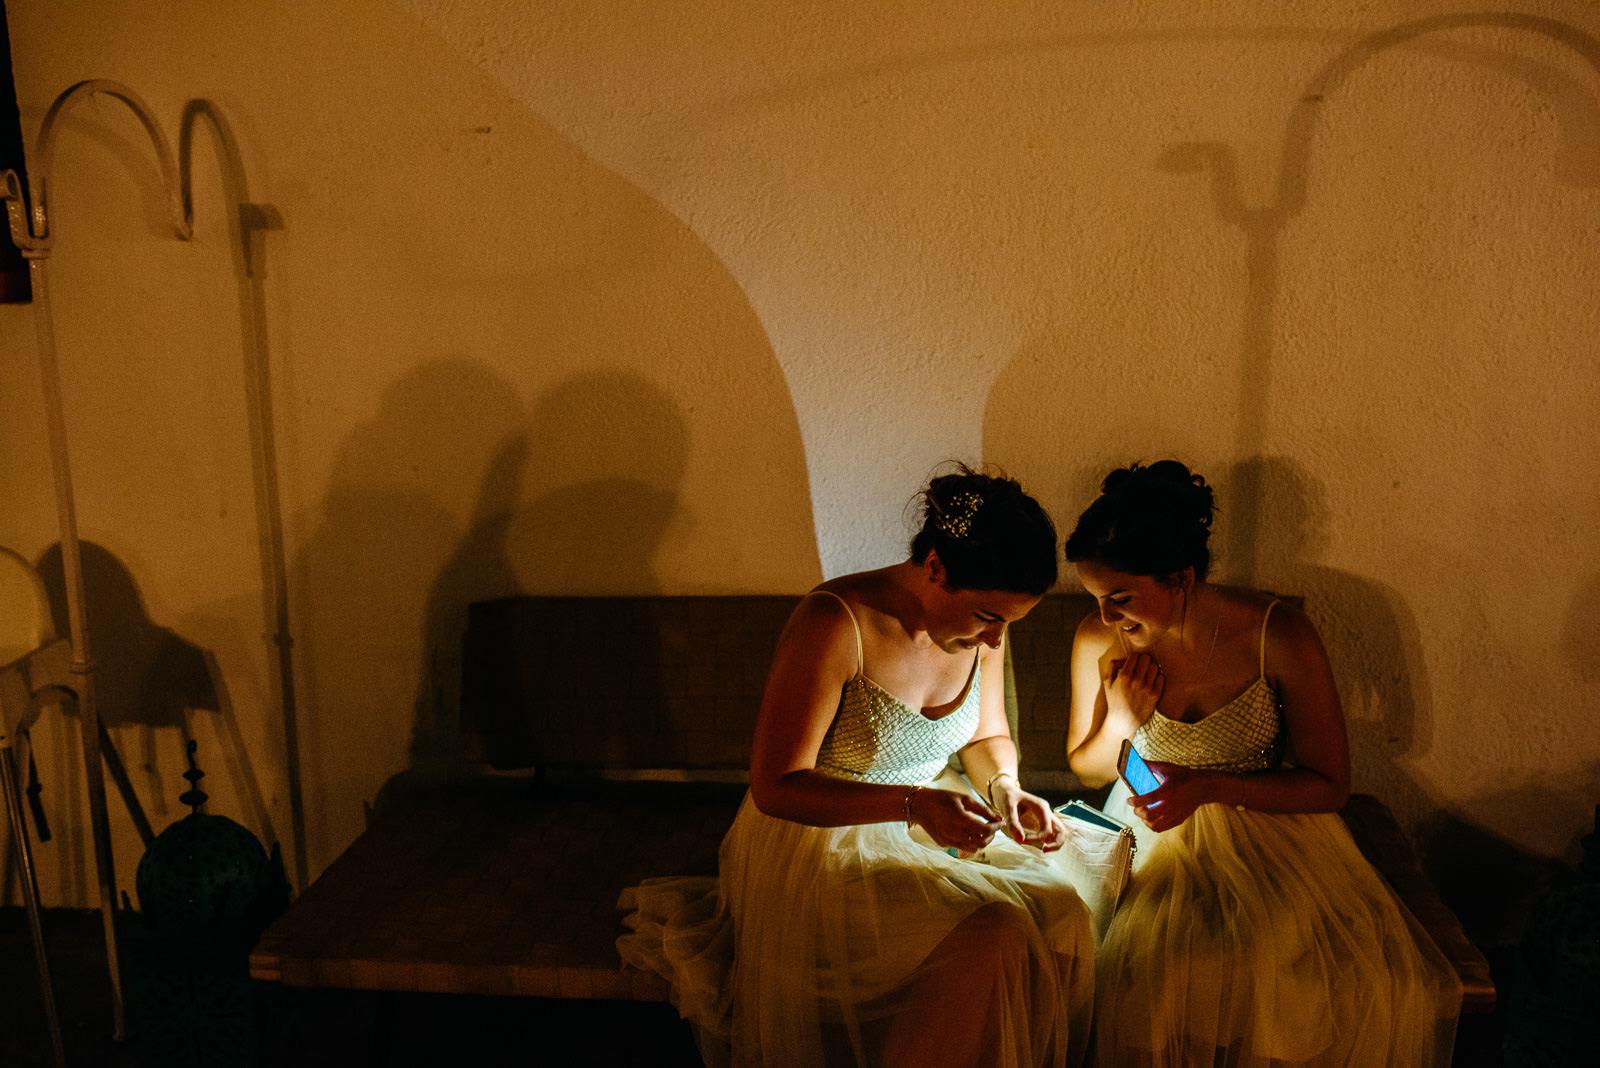 granada_destination_wedding_spain_066